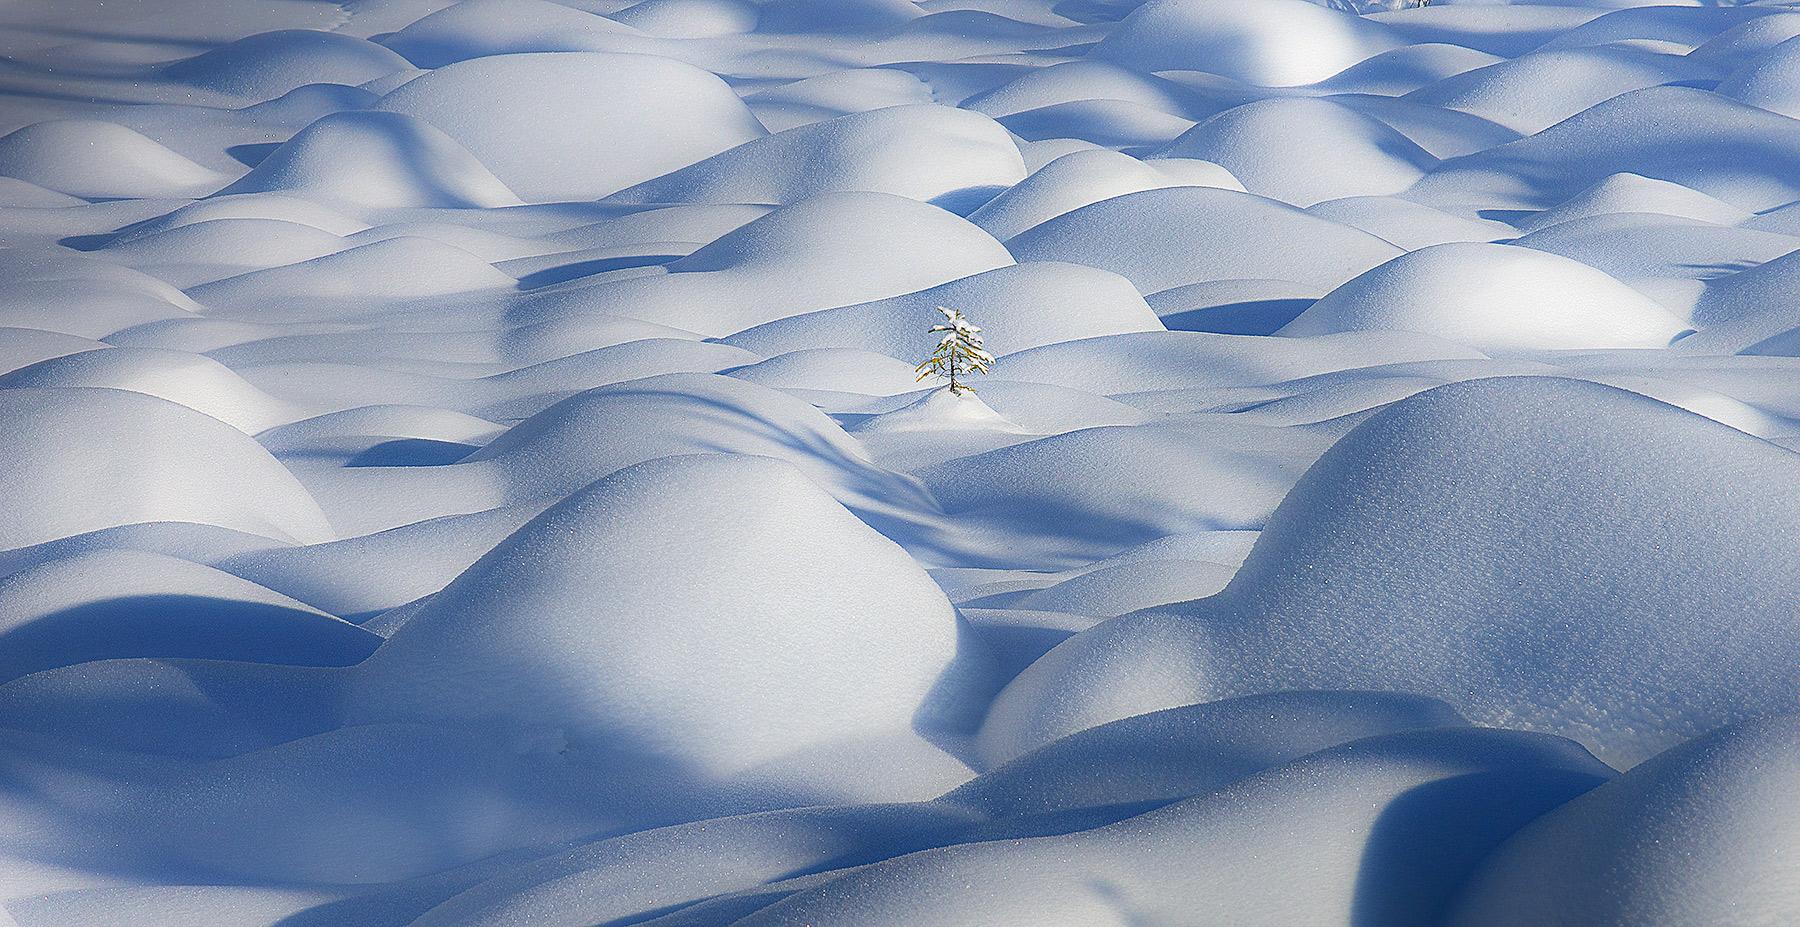 Lone tree, tree, winter, struggle, emerge, canada, jasper, snow, photo